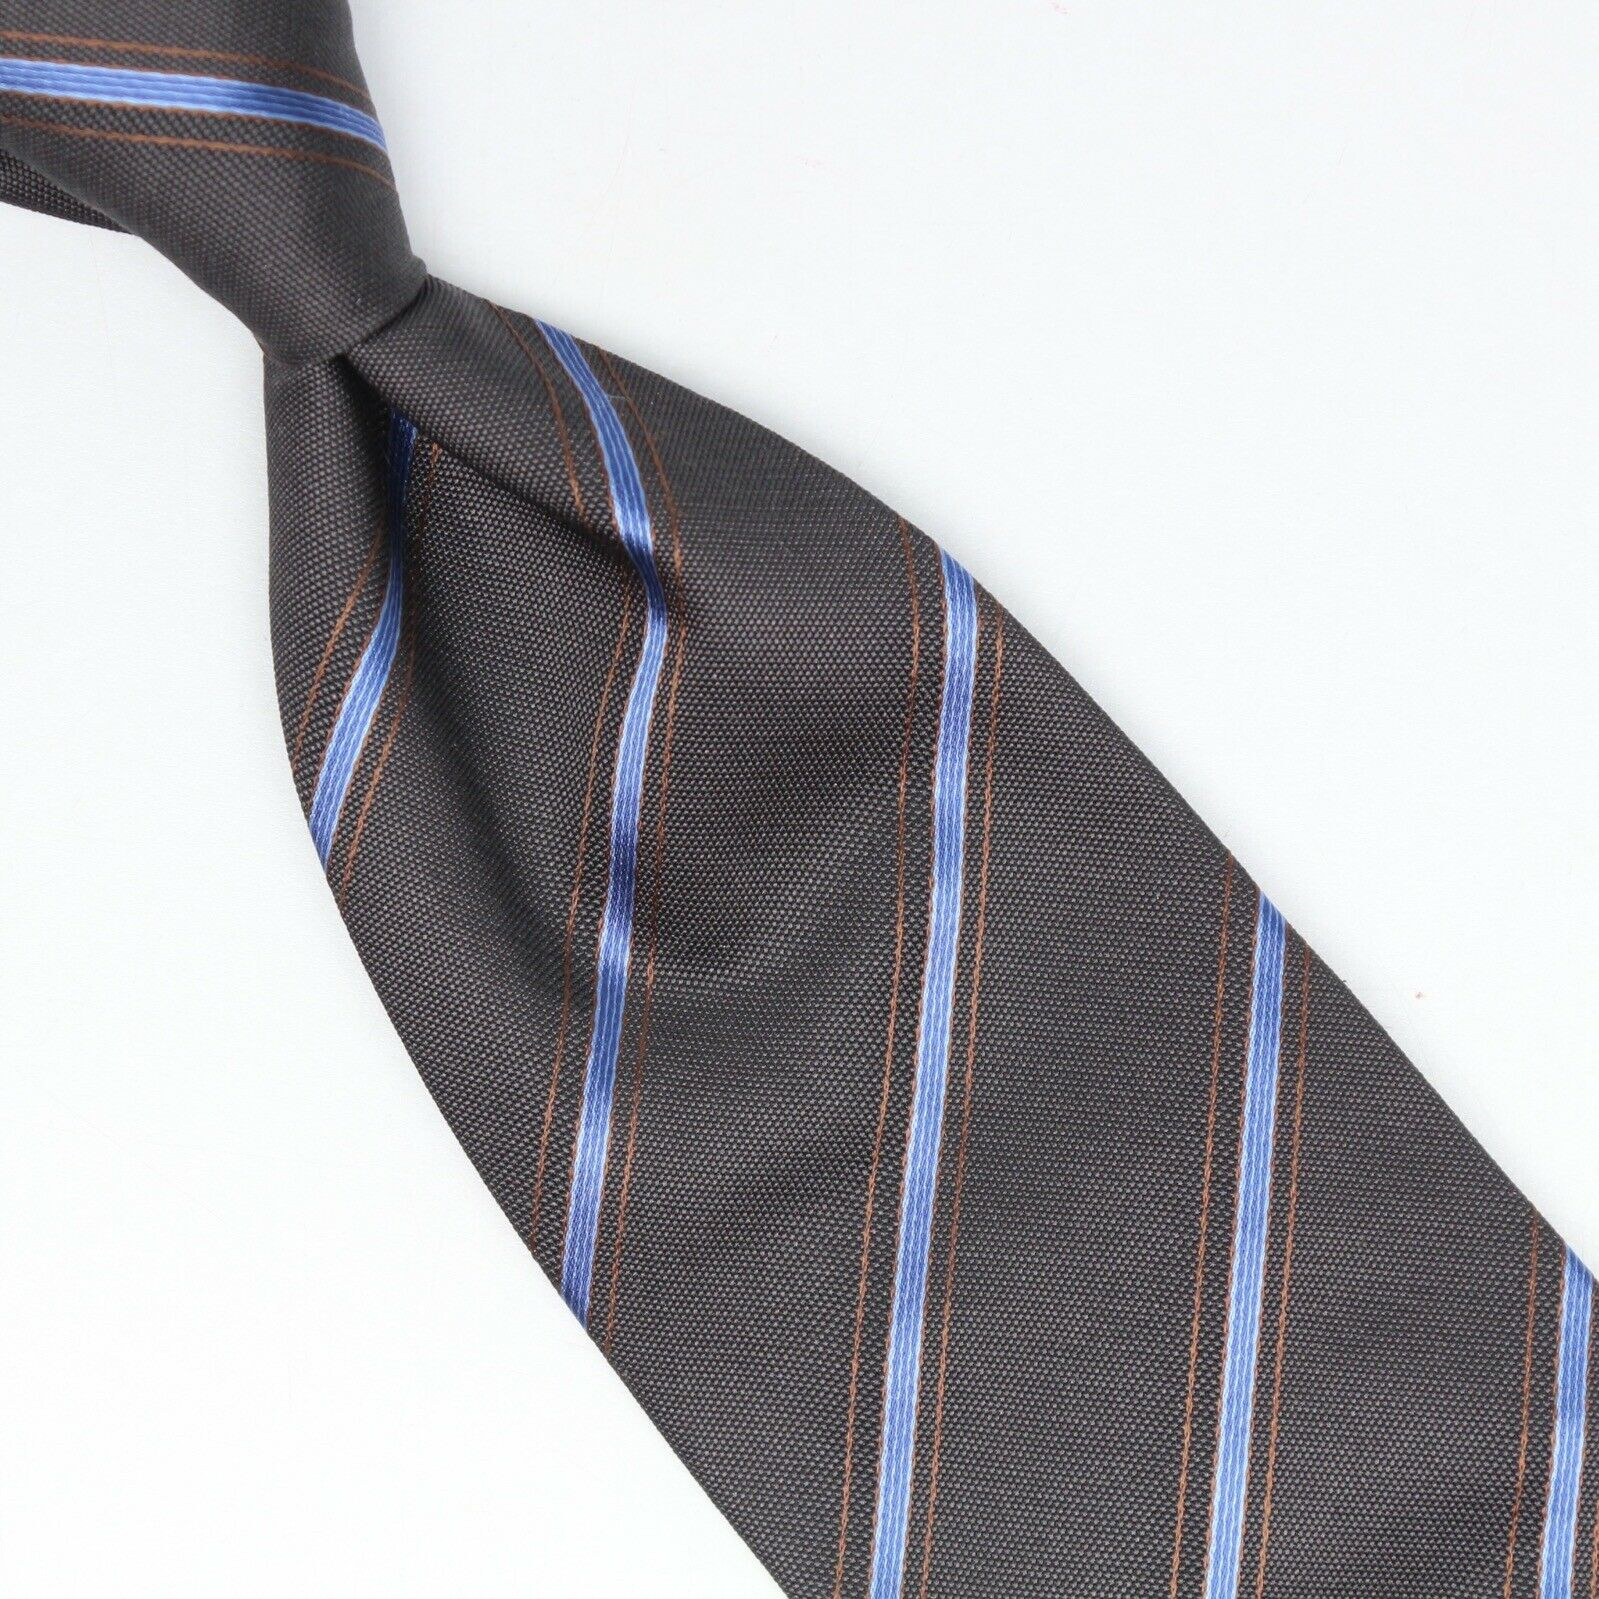 John G Hardy Herren Seidenkrawatte Grau Blau Goldstreifen Gewebt Skinny Dünn | Leicht zu reinigende Oberfläche